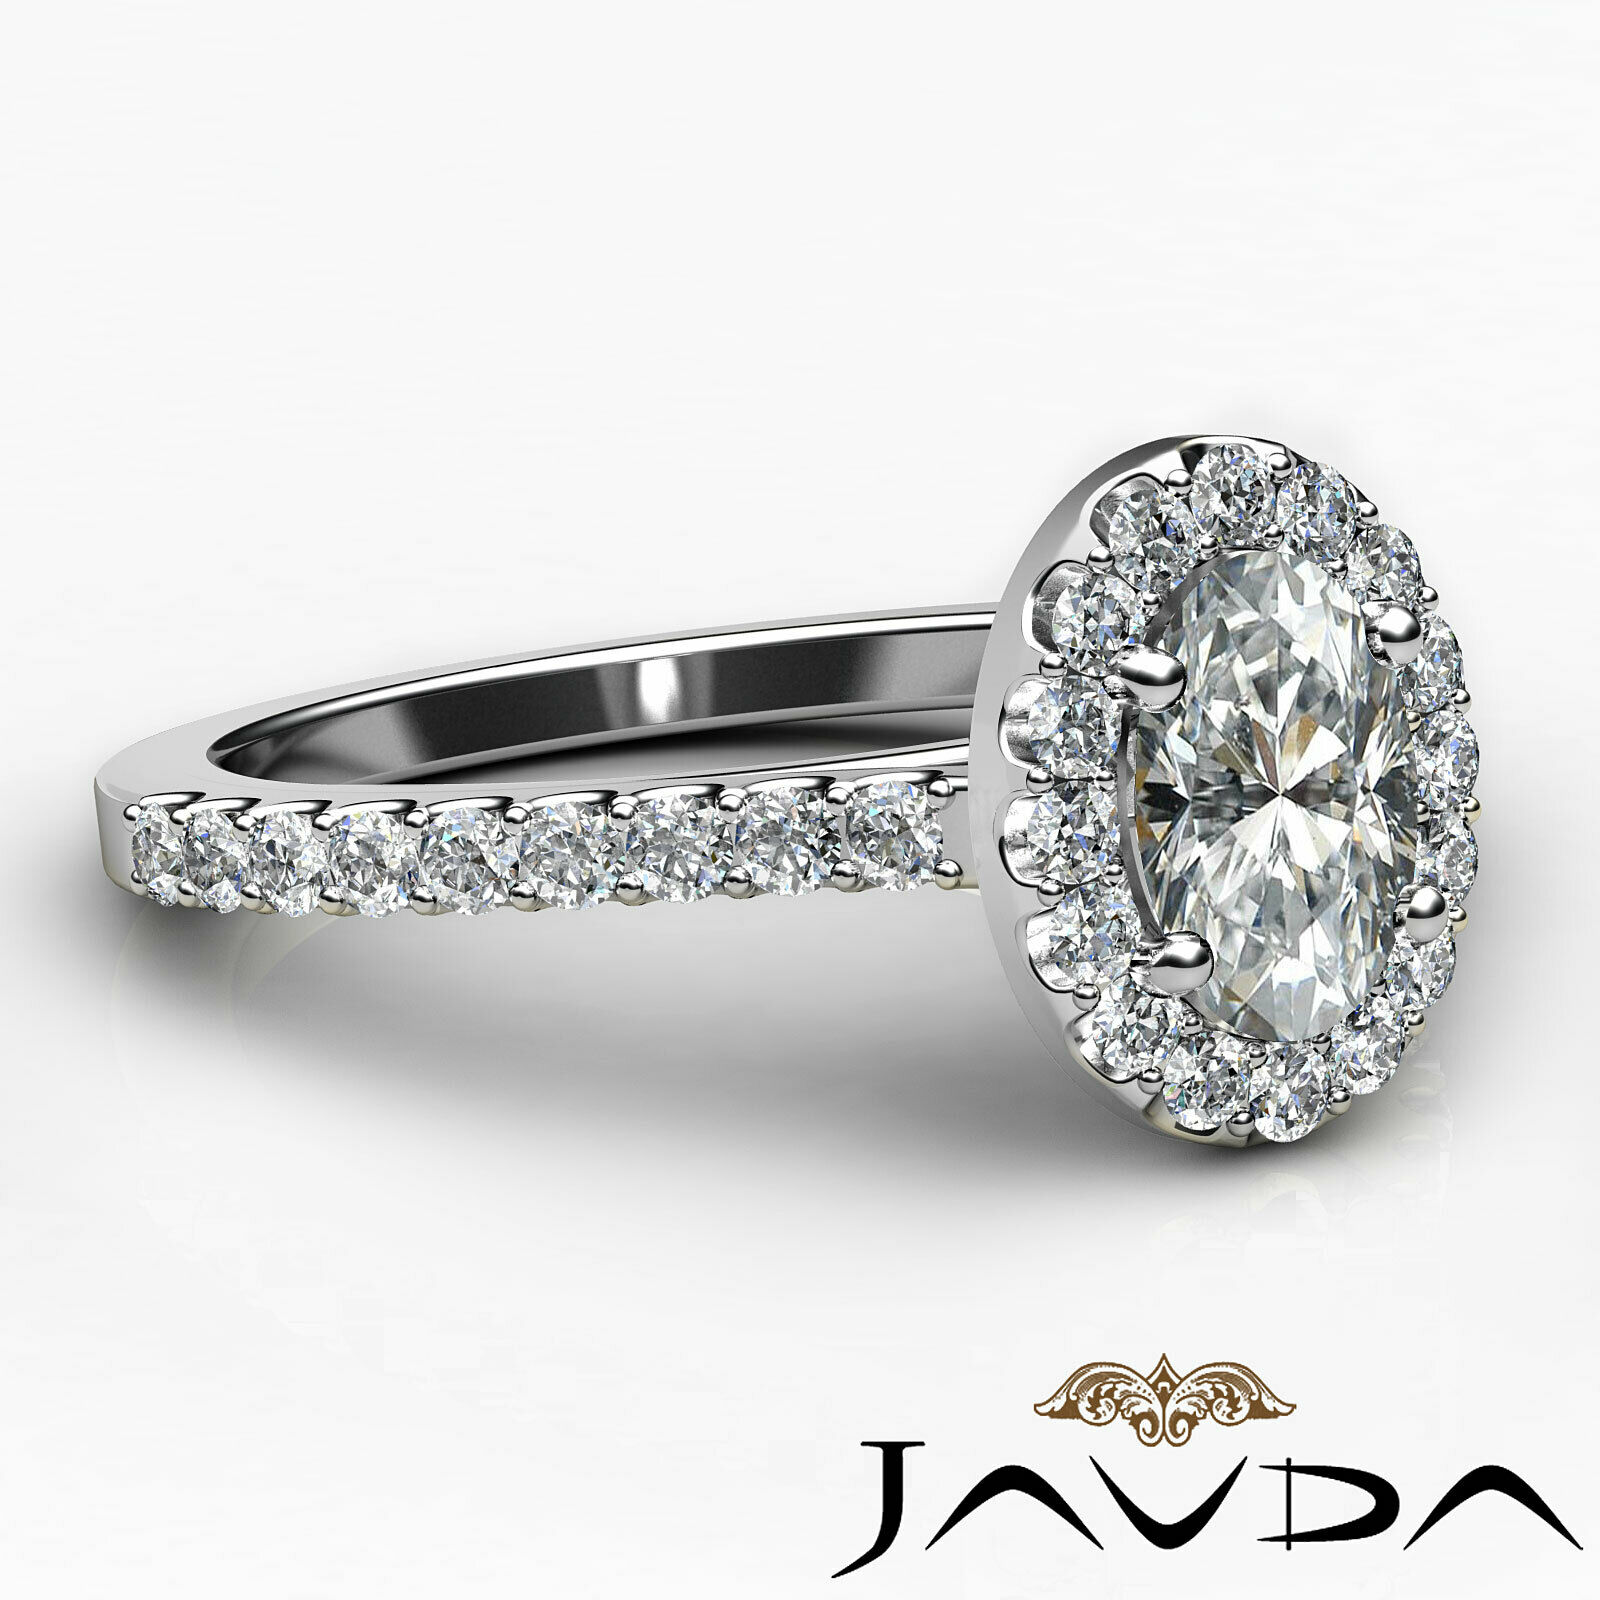 1.6ctw Prong Setting Oval Diamond Engagement Ring GIA H-VS1 White Gold Women New 2